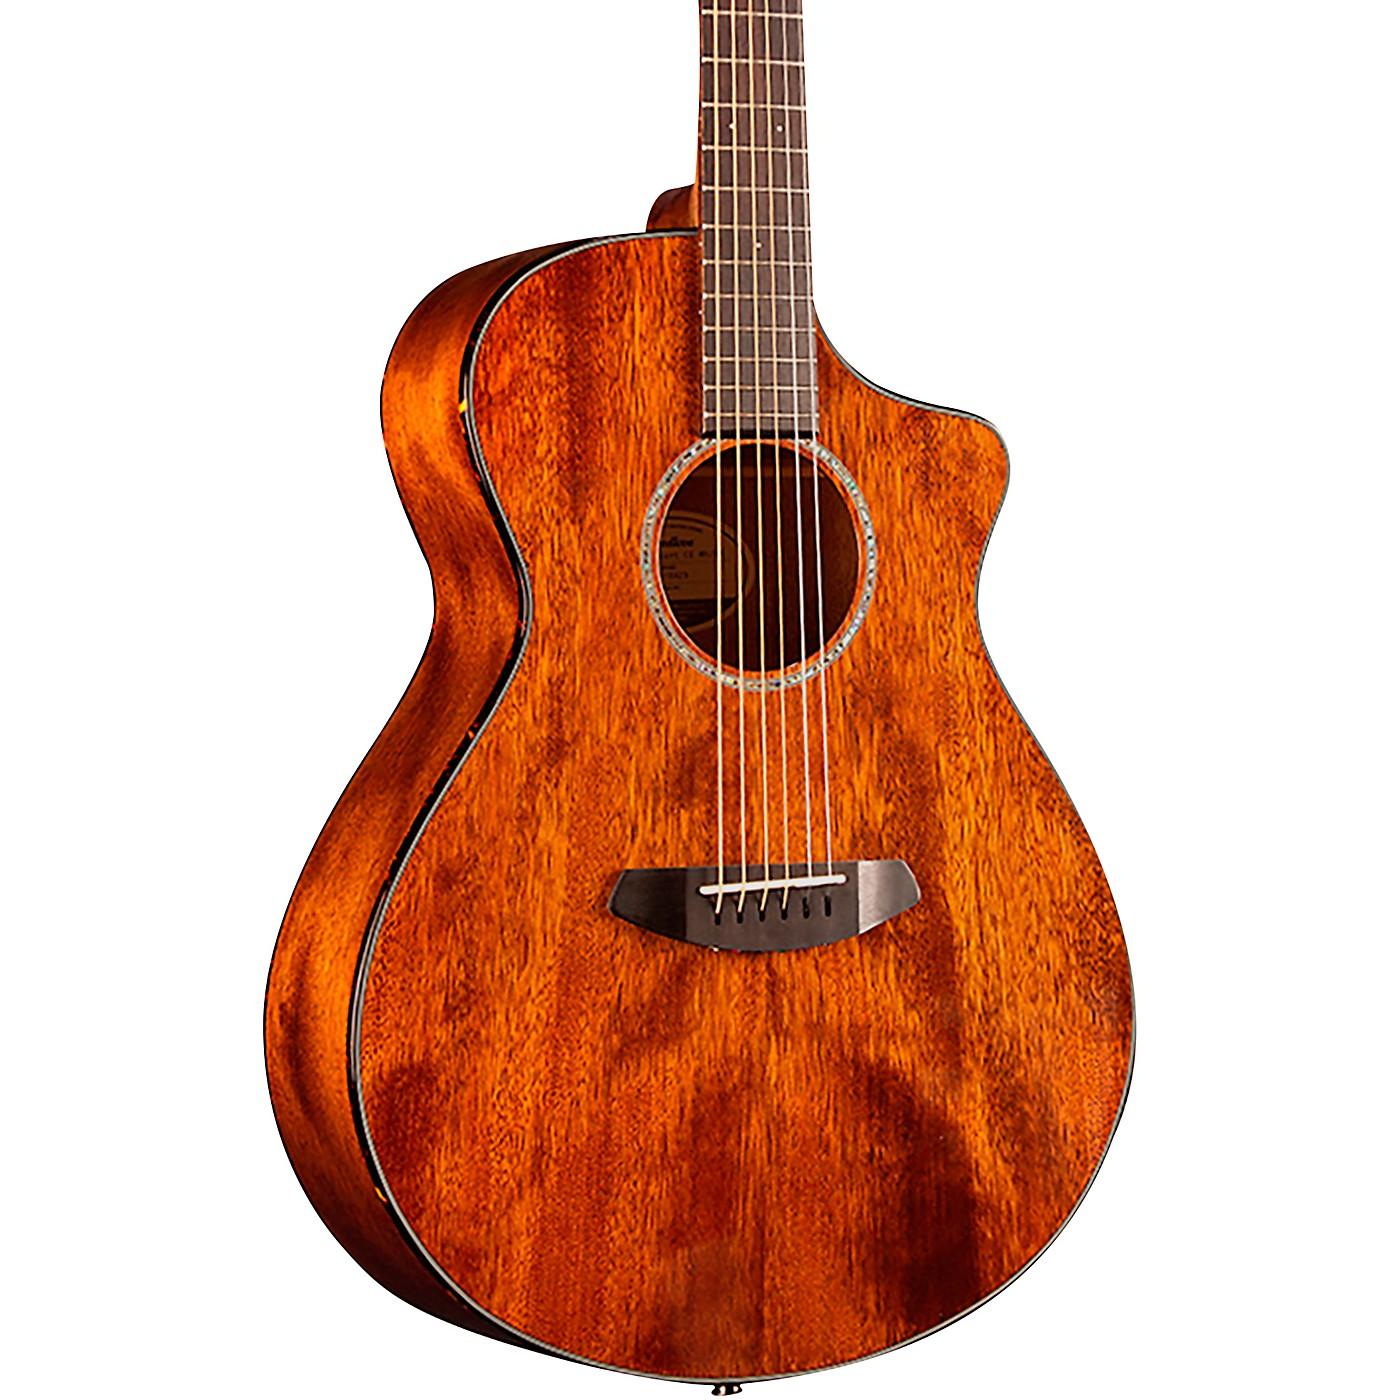 Breedlove Pursuit Concert Cutaway CE Mahogany Acoustic-Electric Guitar thumbnail